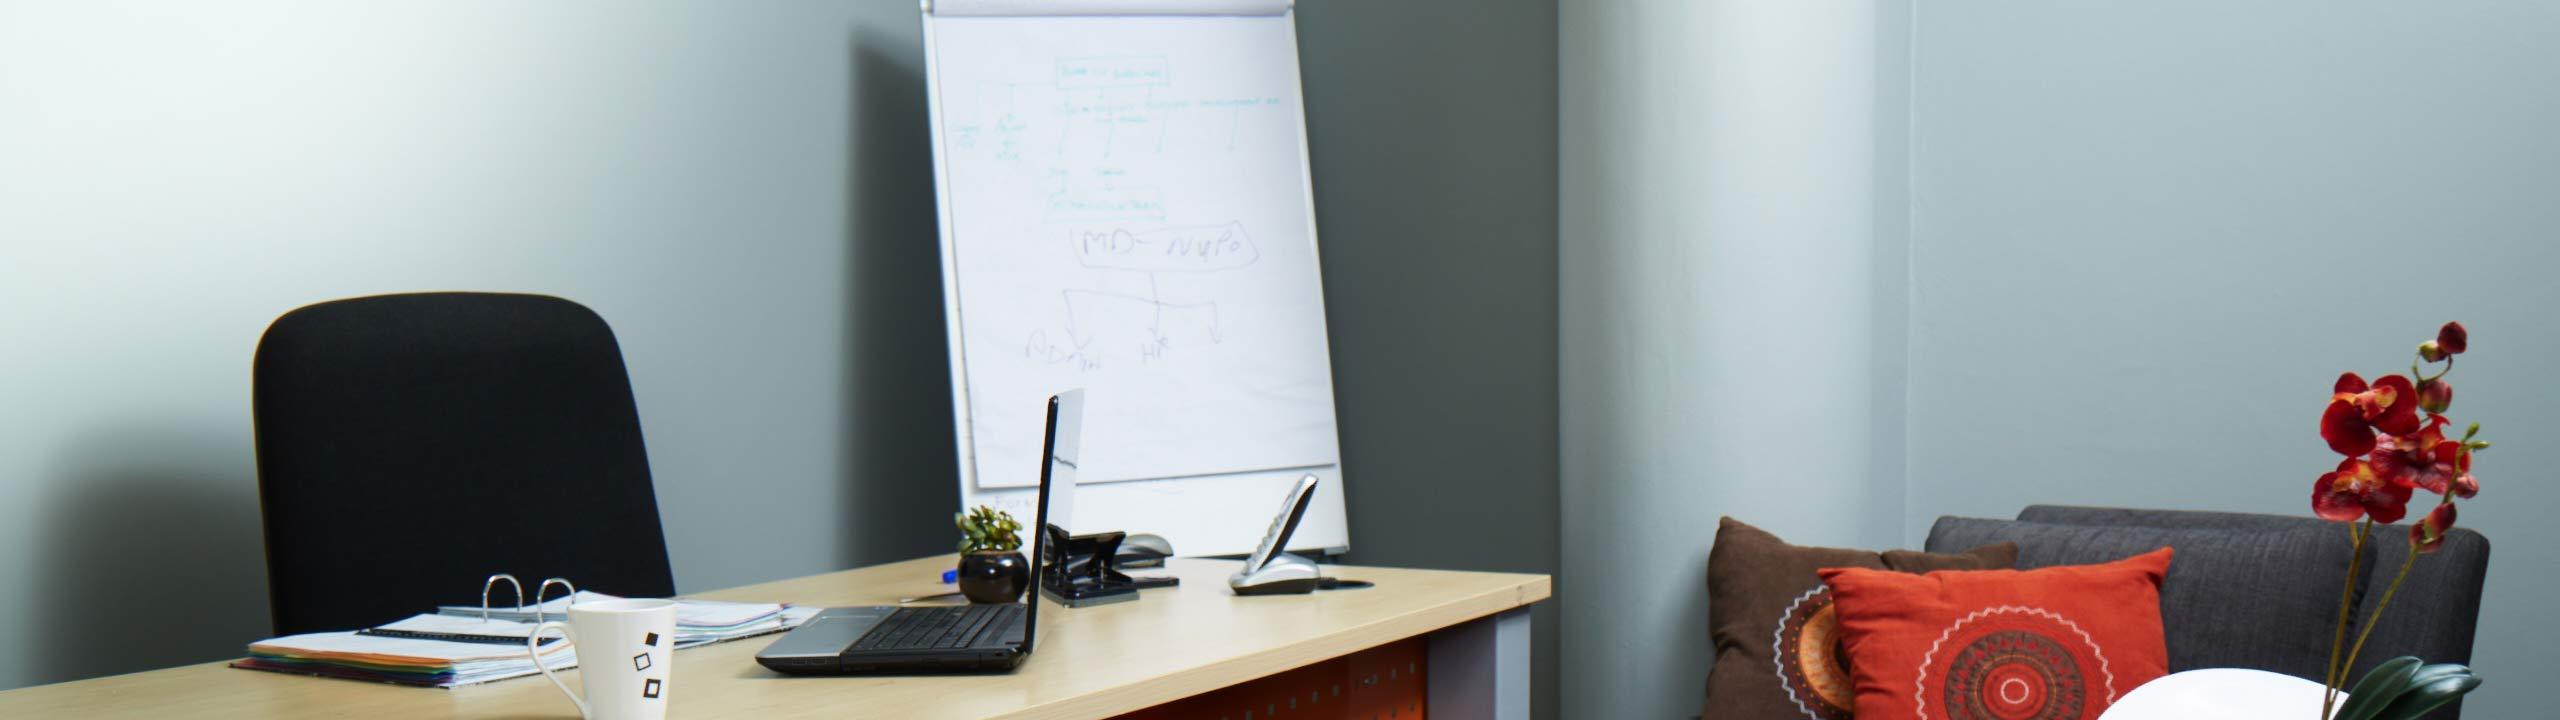 Flexi Office FAQ